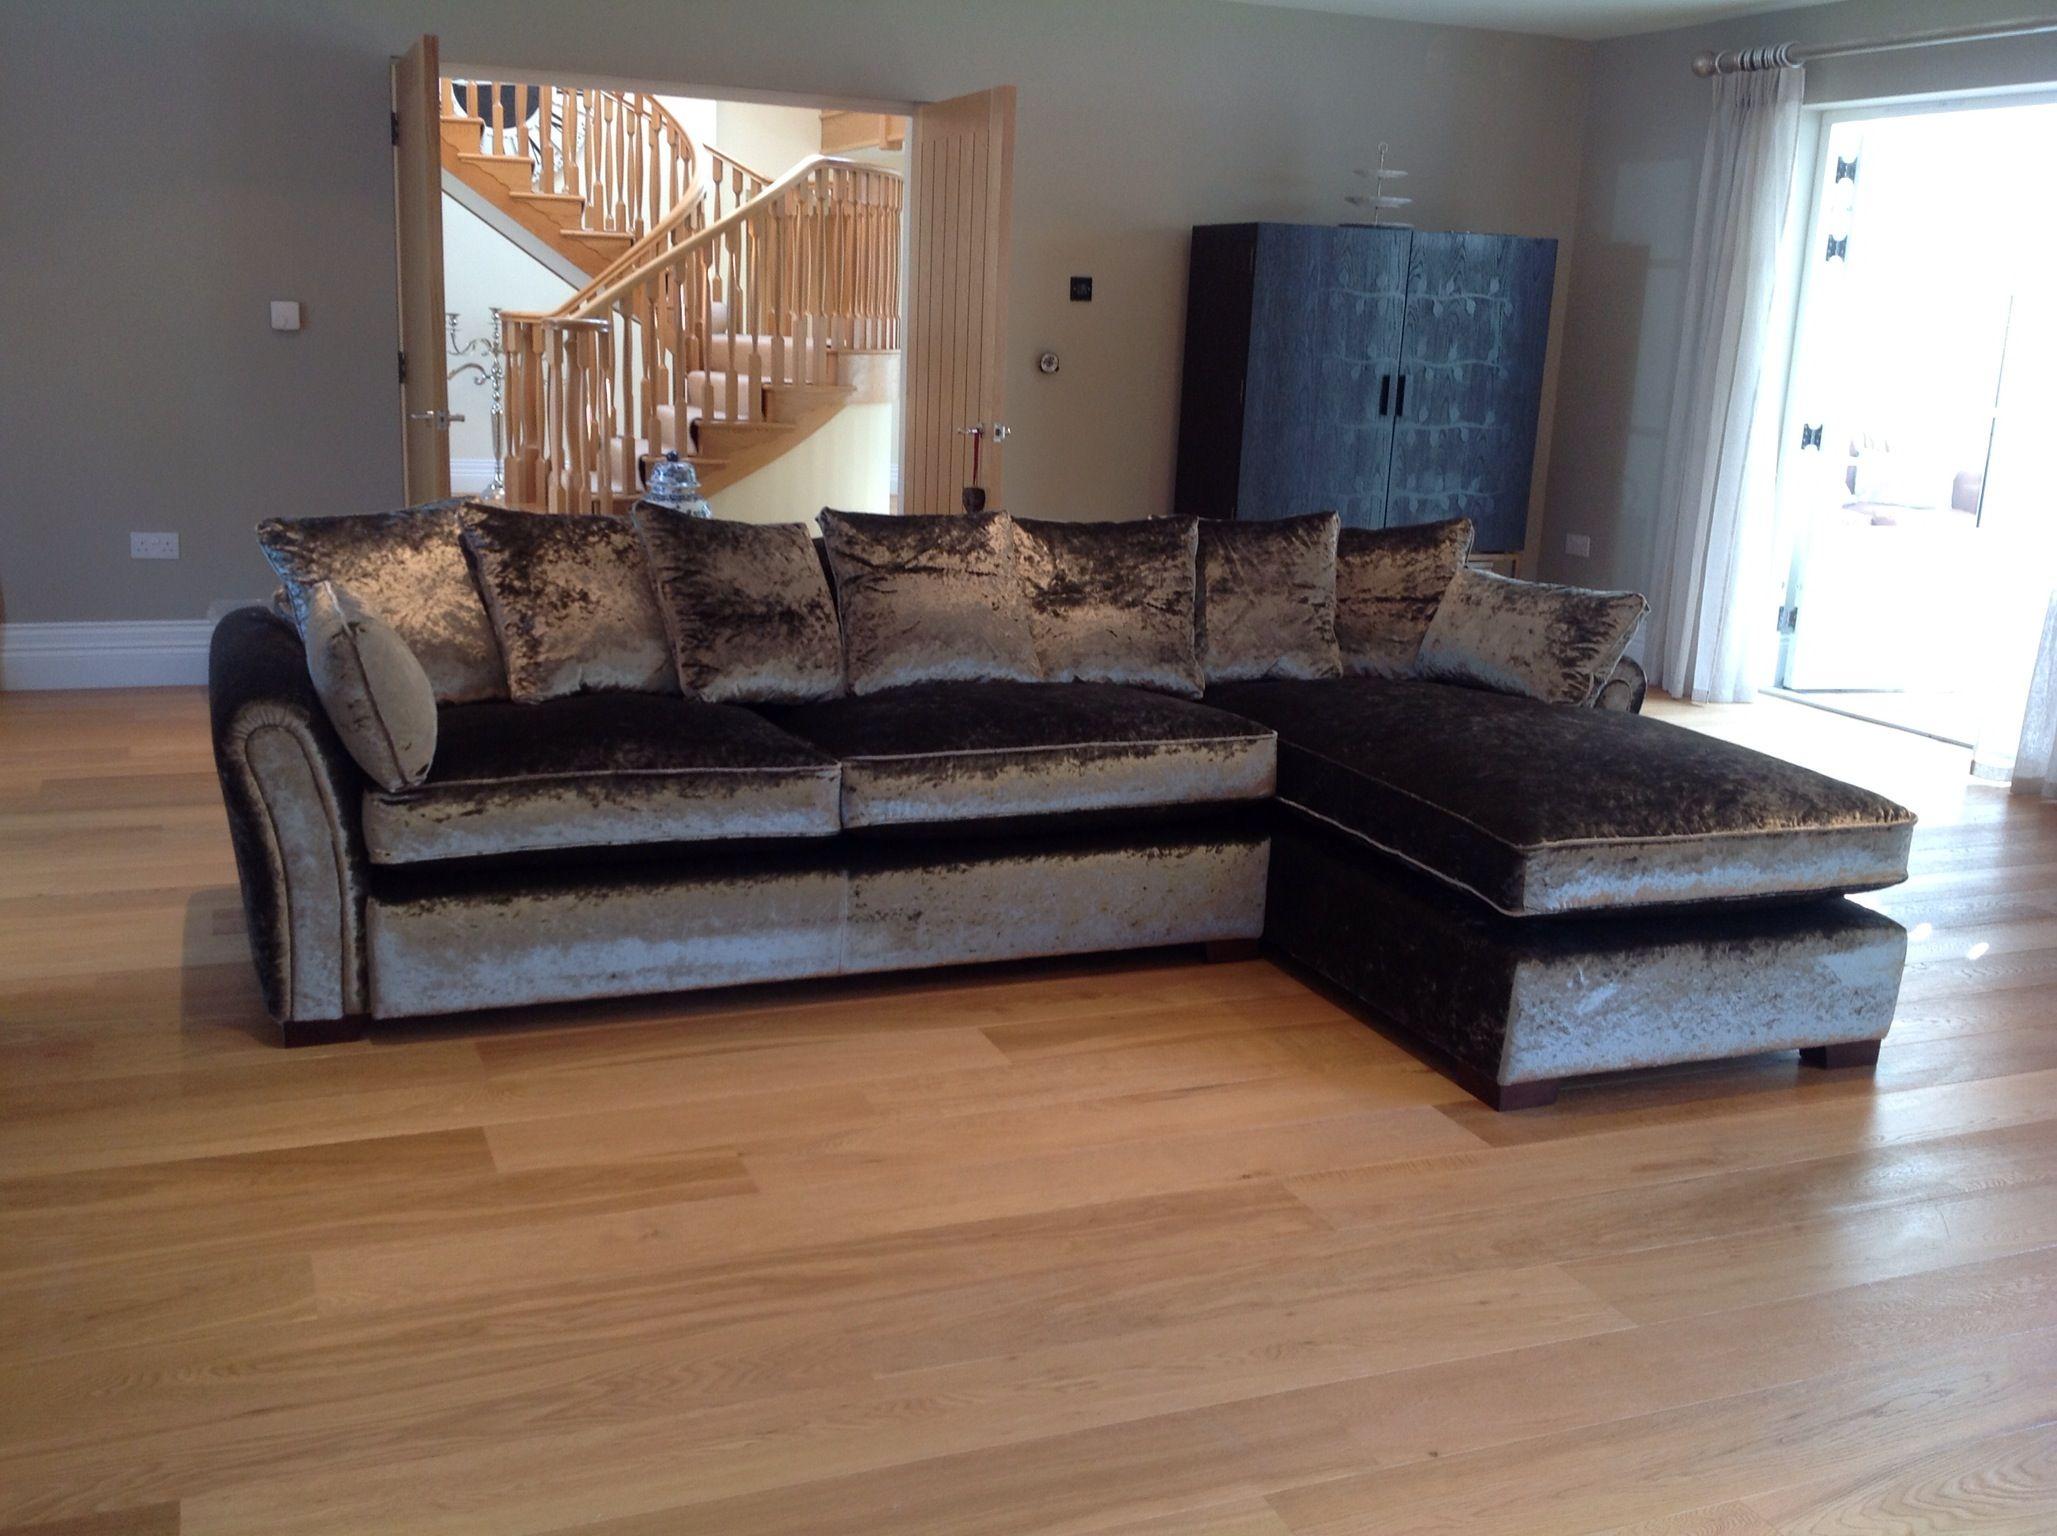 Attic bedroom tufted sofa